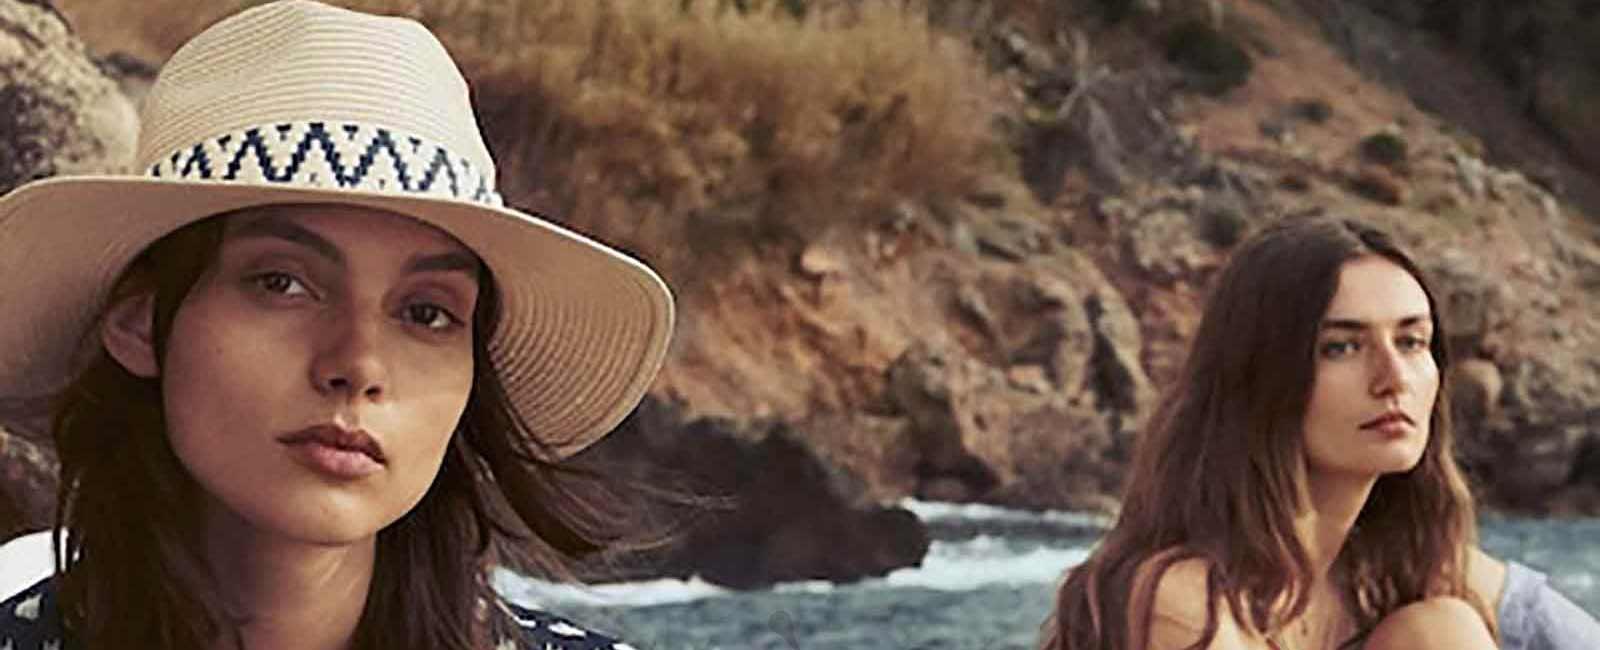 Buscando mi sombrero de paja